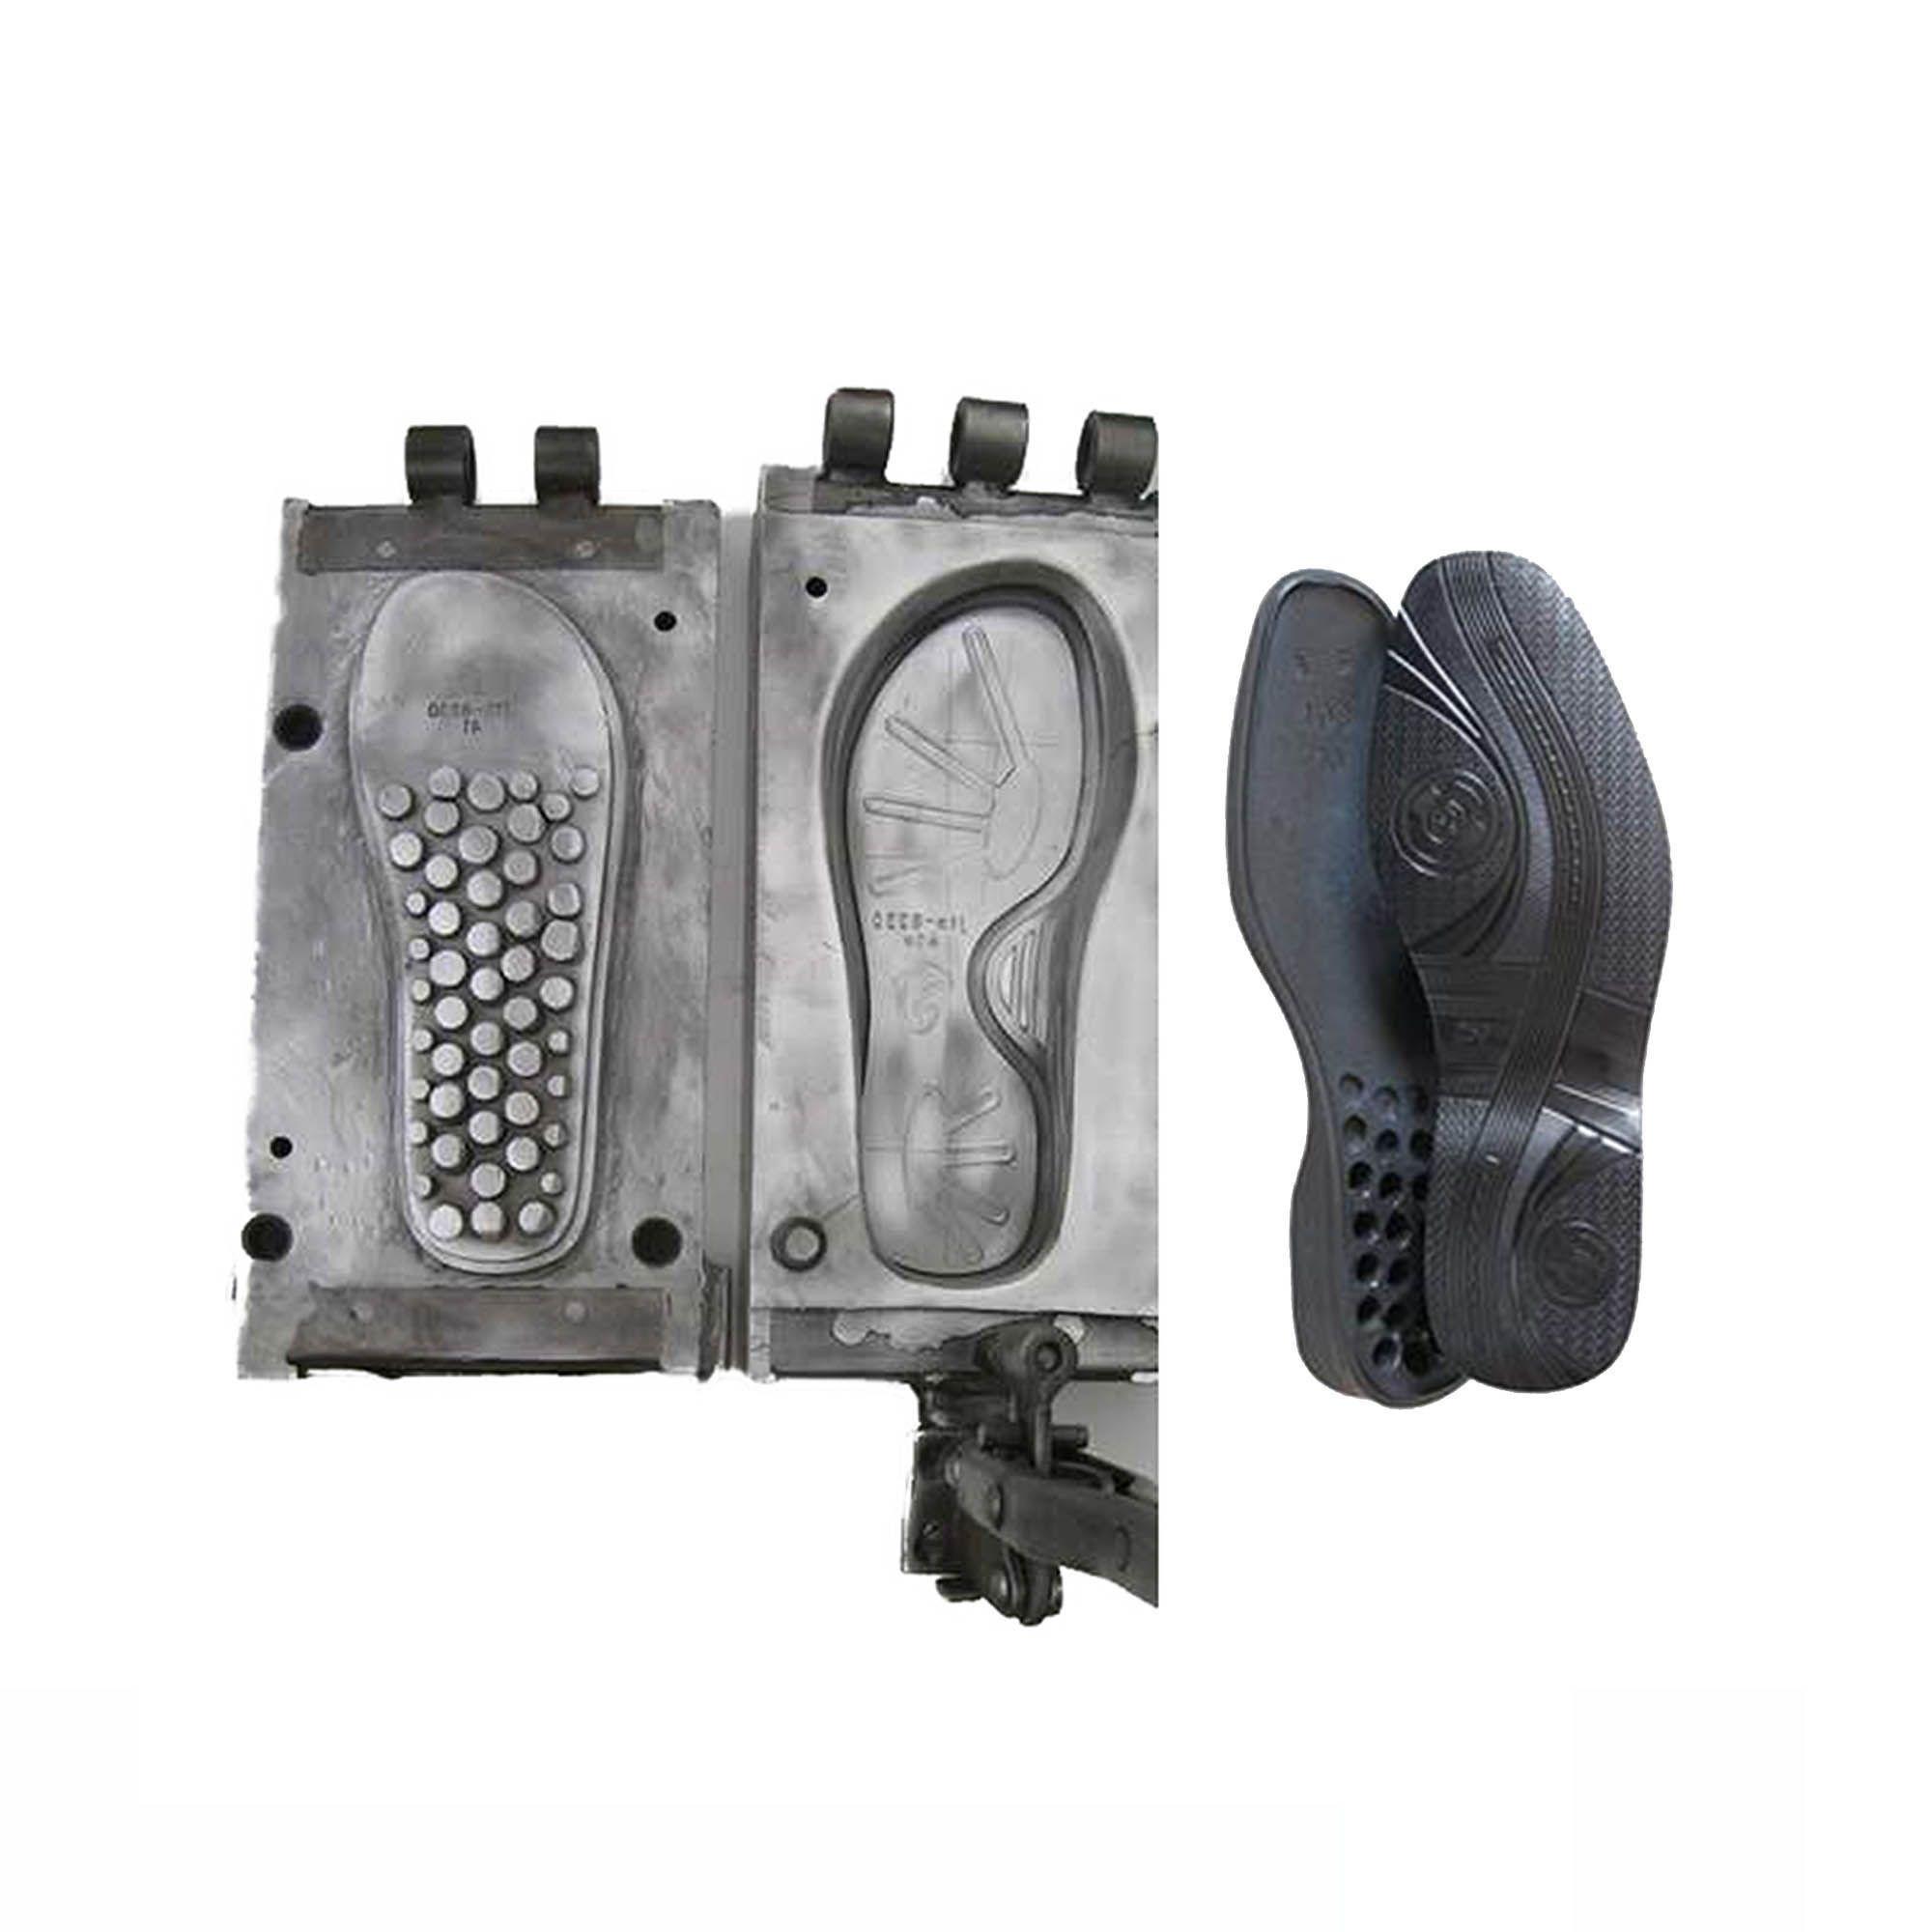 PU Polyurethane Foam Injection Plastic Shoe Insole Making Mold